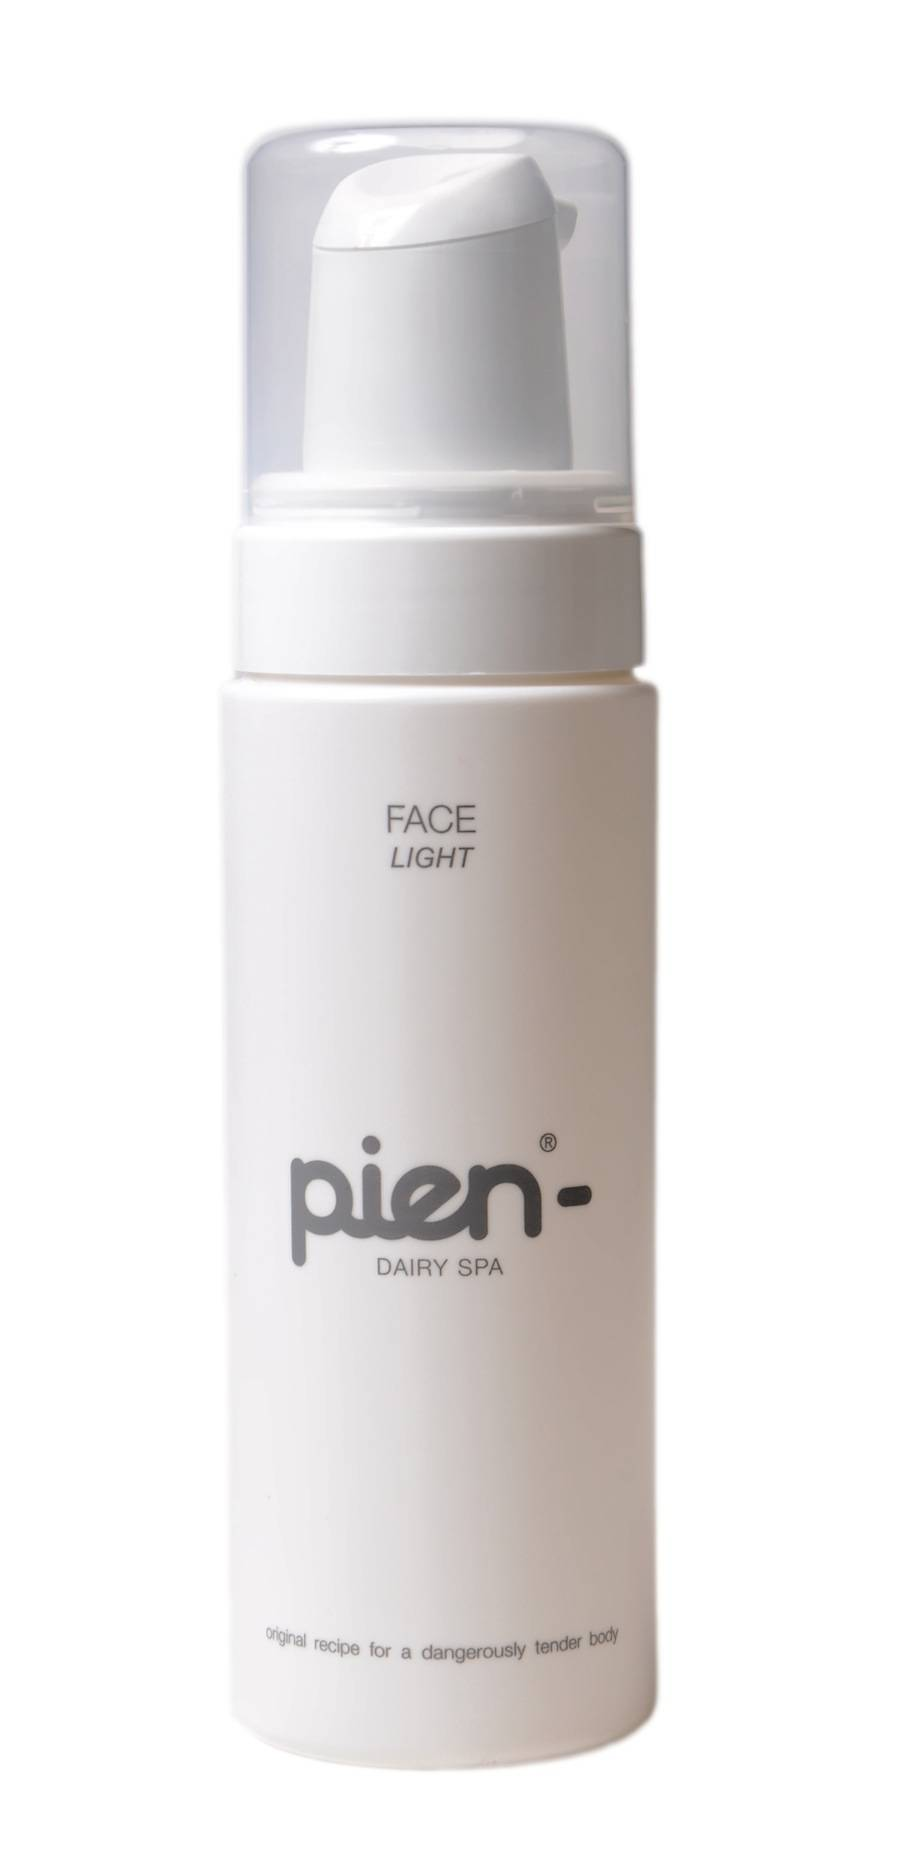 Pien- DAIRY SPA Face light